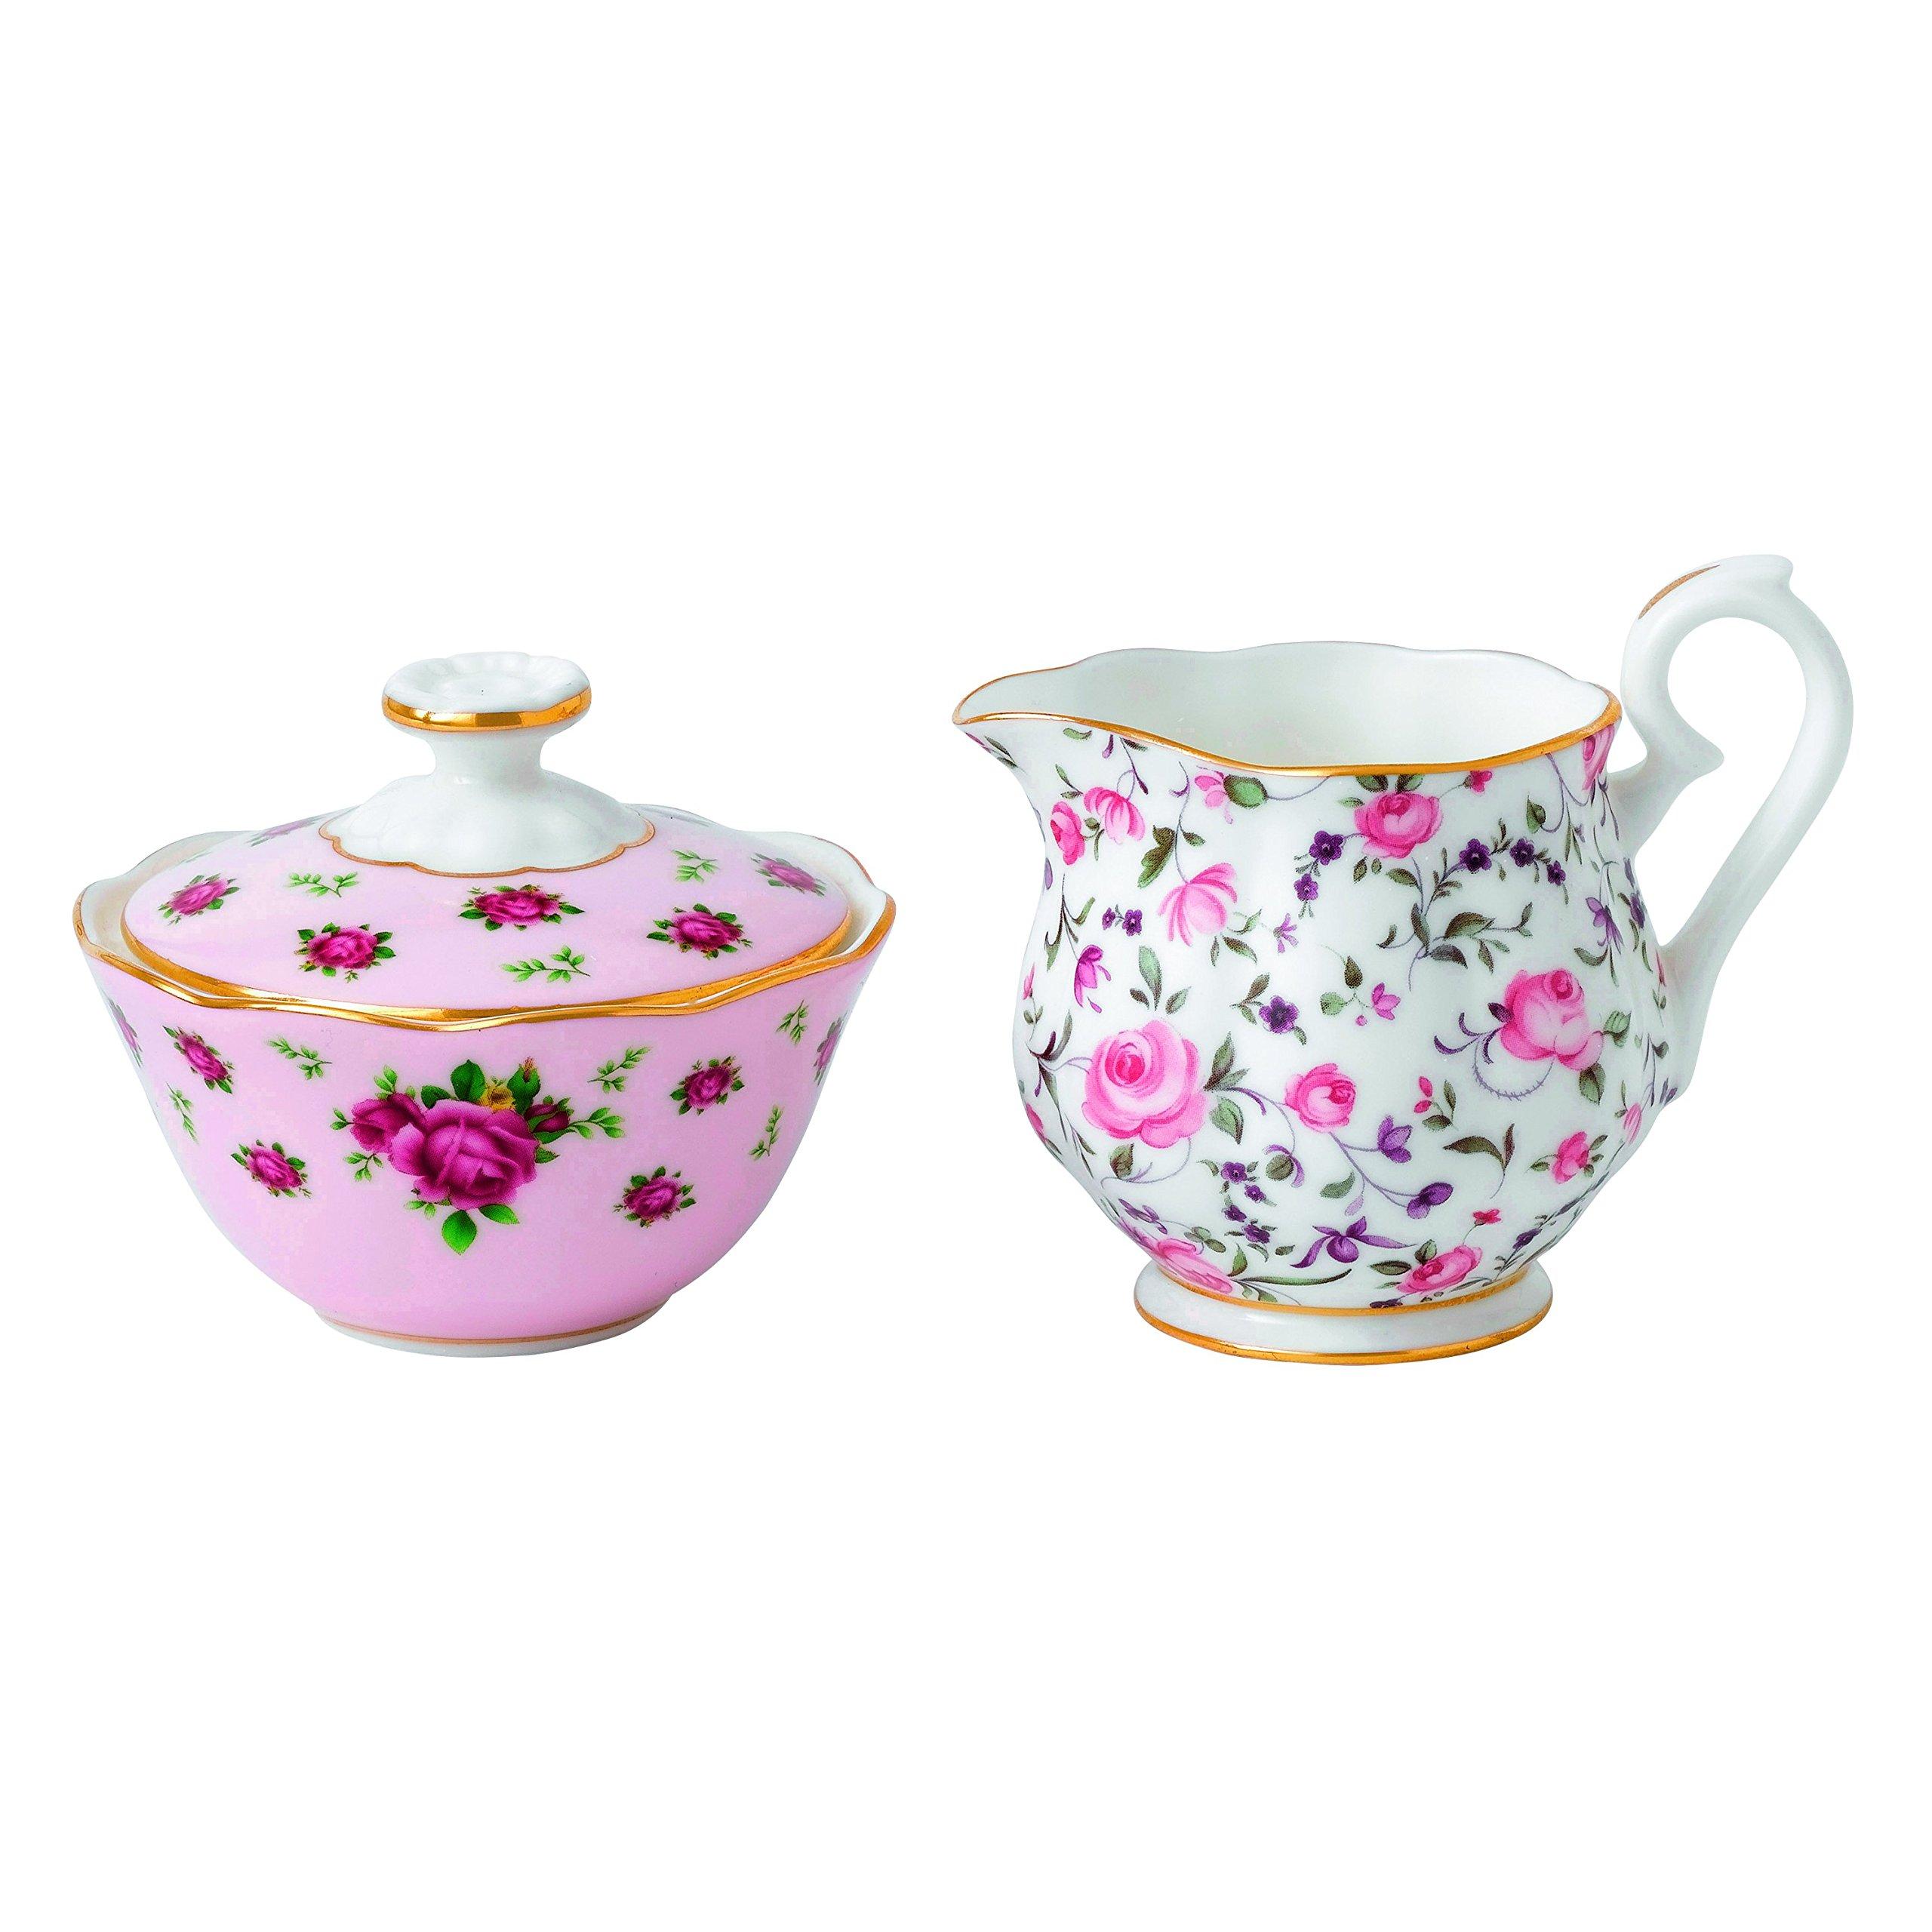 Royal Albert New Country Roses Tea Party Mixed Patterns Mini Creamer & Sugar (Set of 2), Multicolor